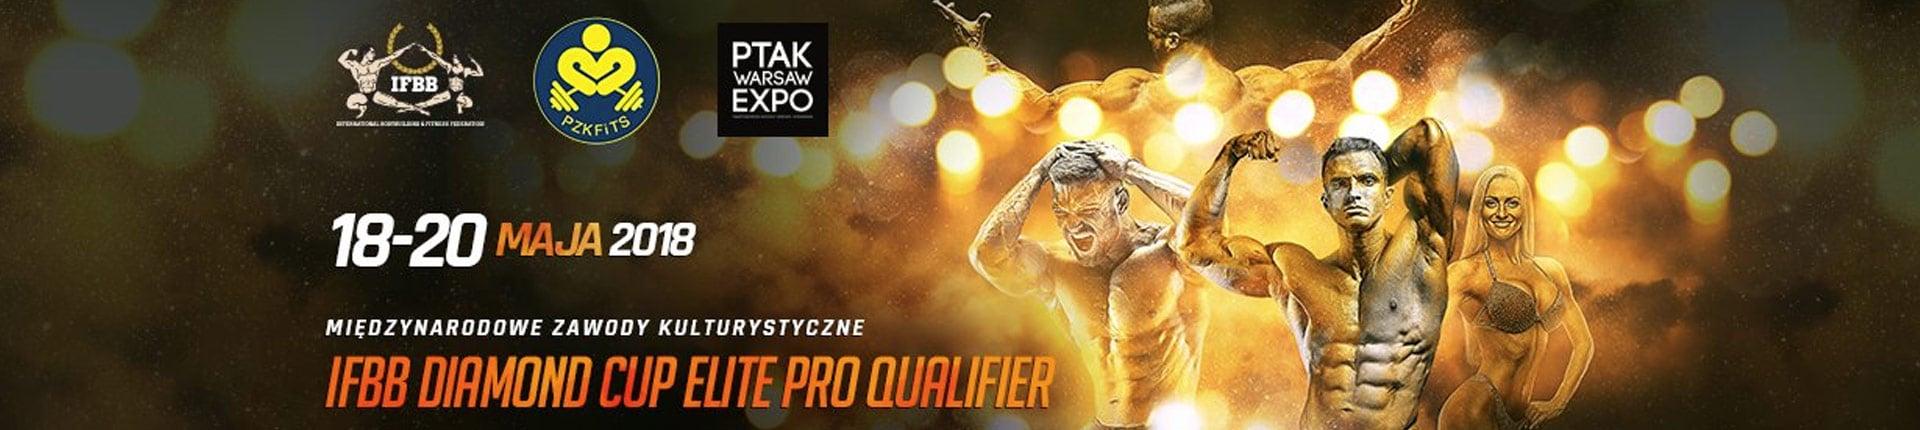 IFBB Diamond Cup Warsaw Ptak Expo - CD.